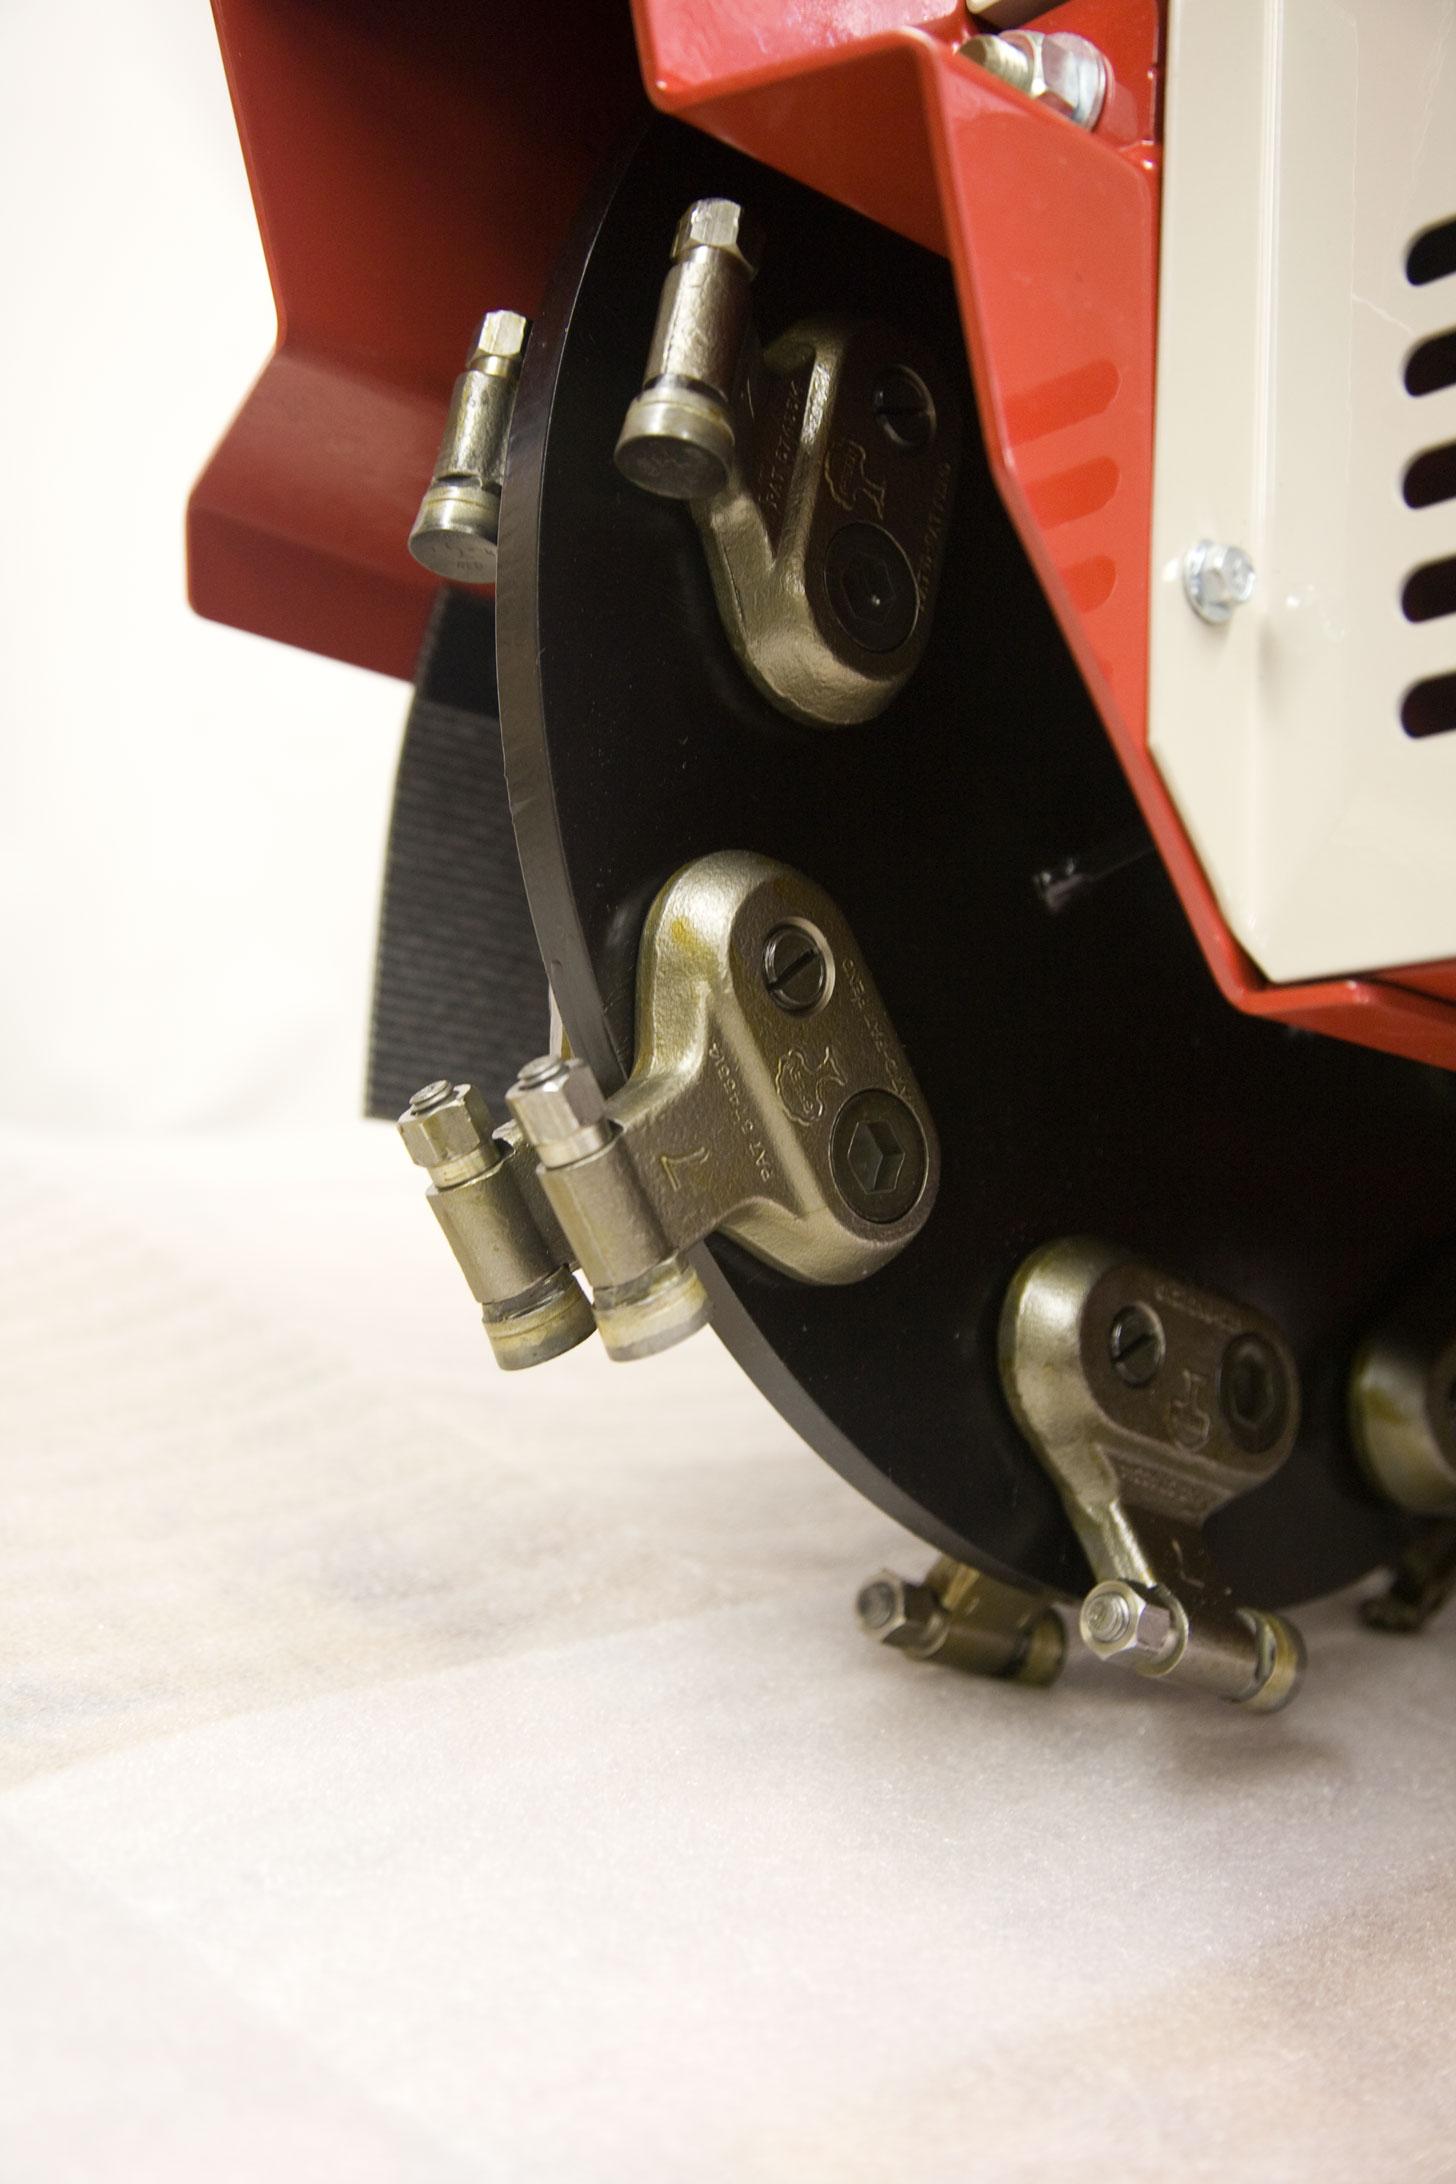 Ventrac Stump grinder